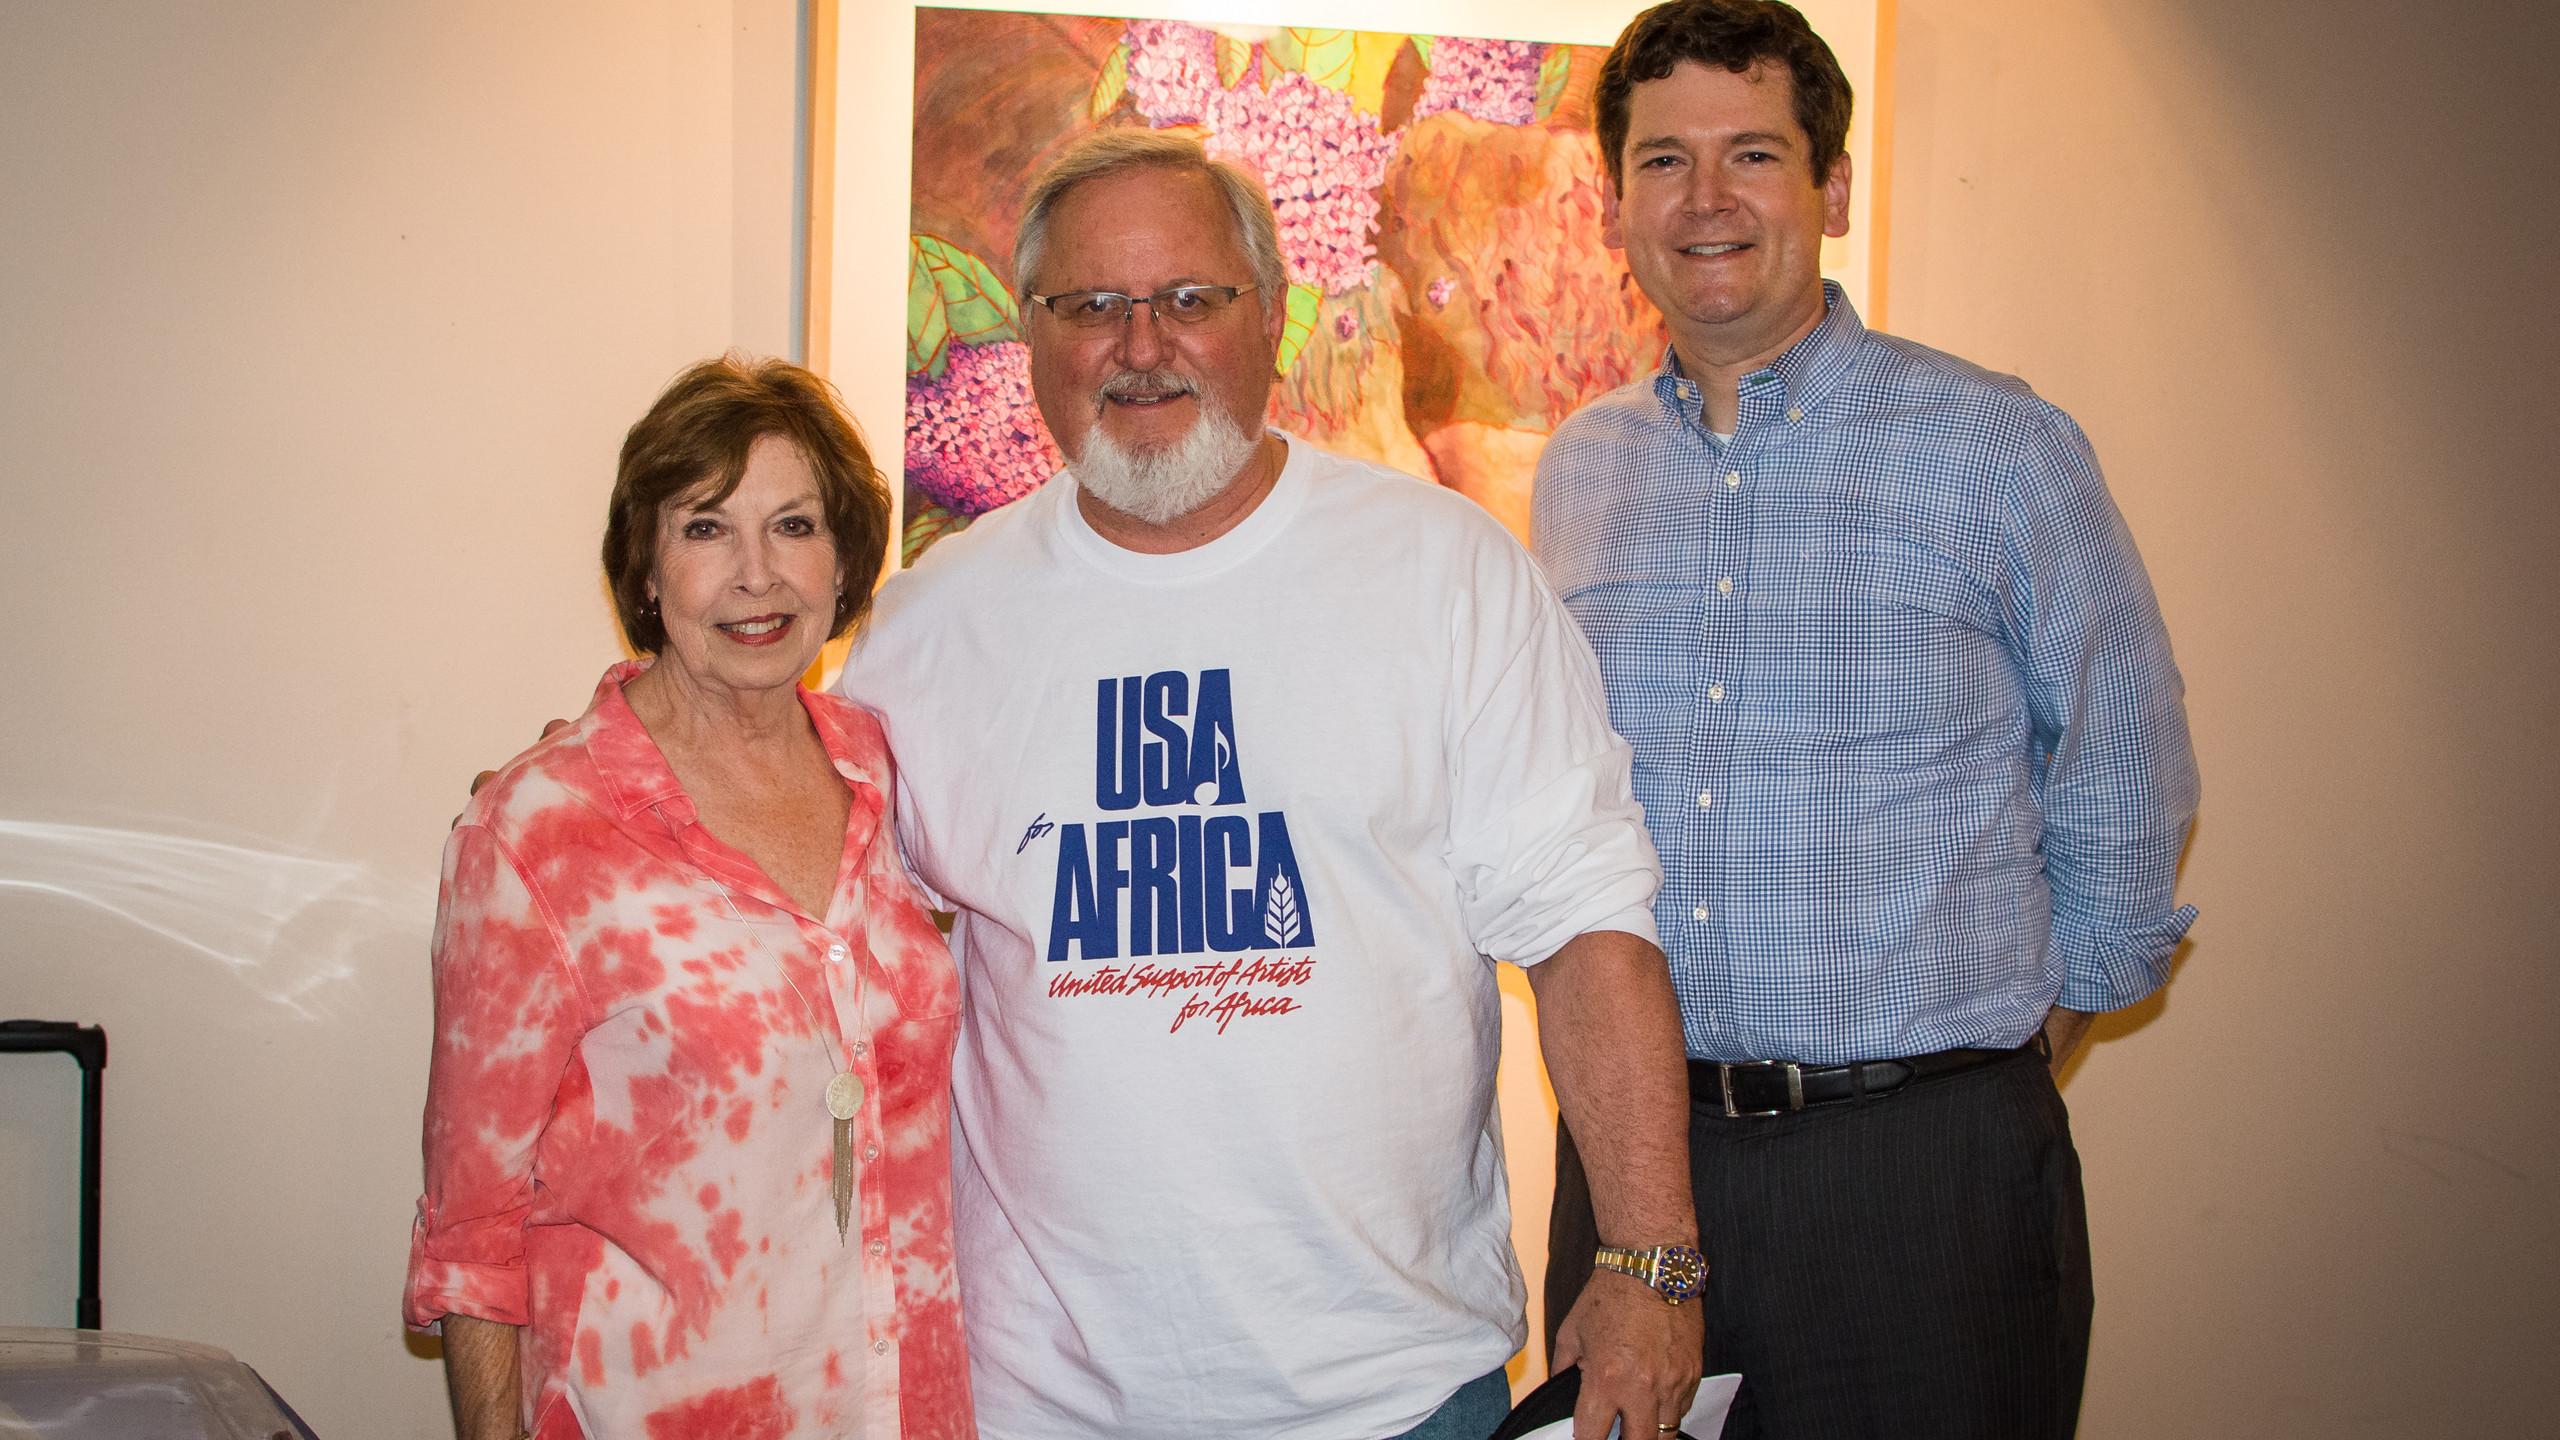 Carole Dorris, Sammy Stuard, and Joel Wallace